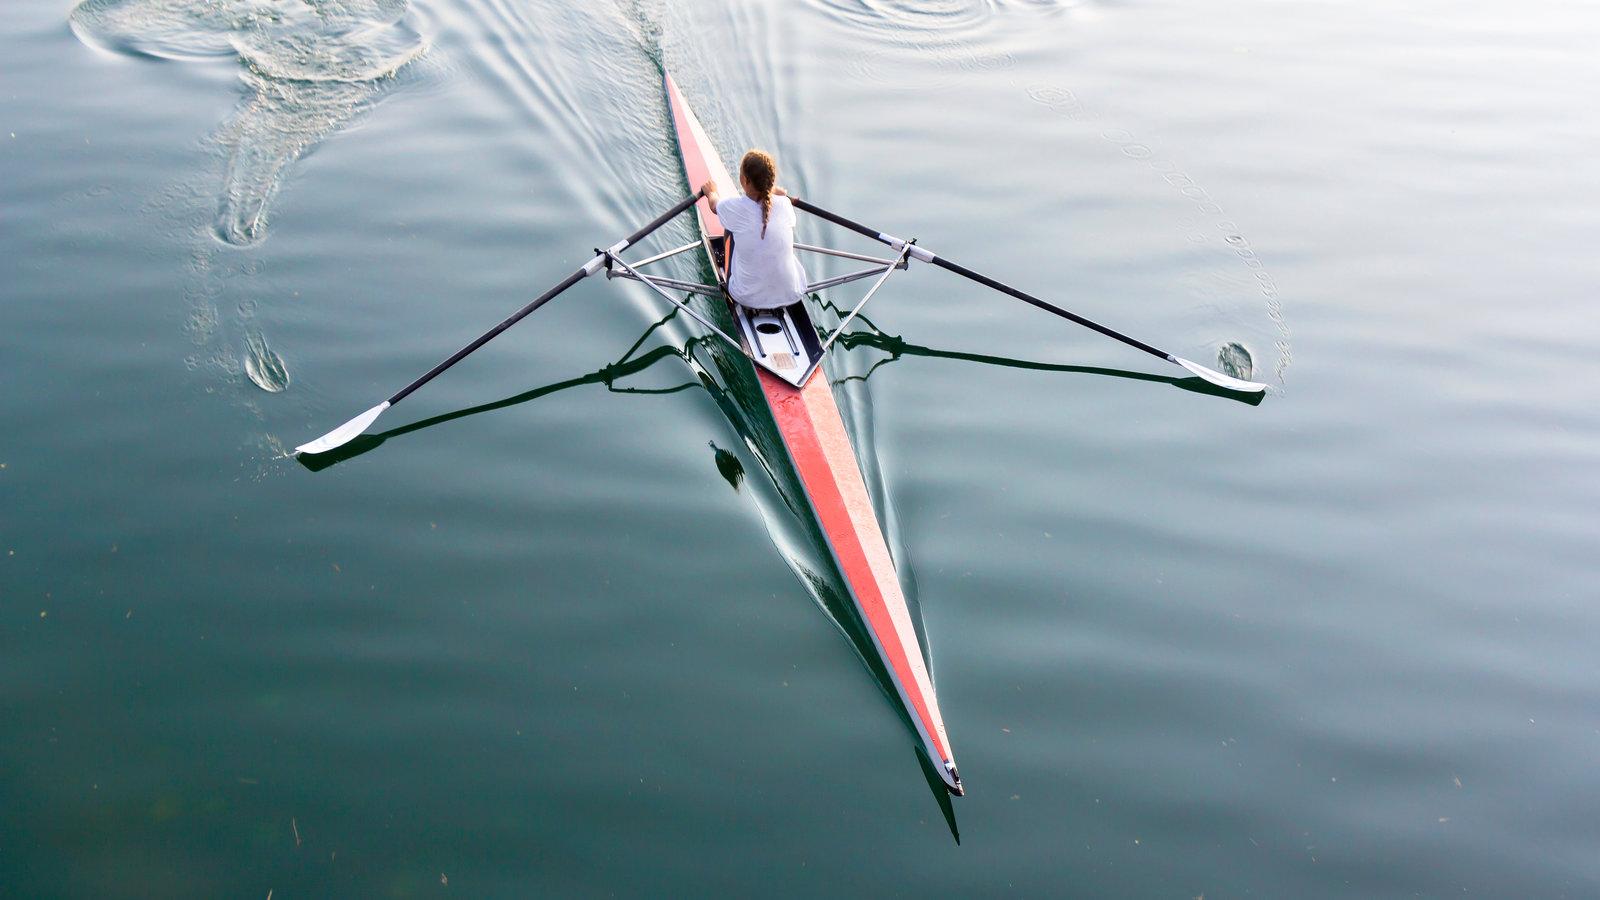 https://www.rowing.ee/wp-content/uploads/2020/12/Soudespordikool-NY-Times.jpg